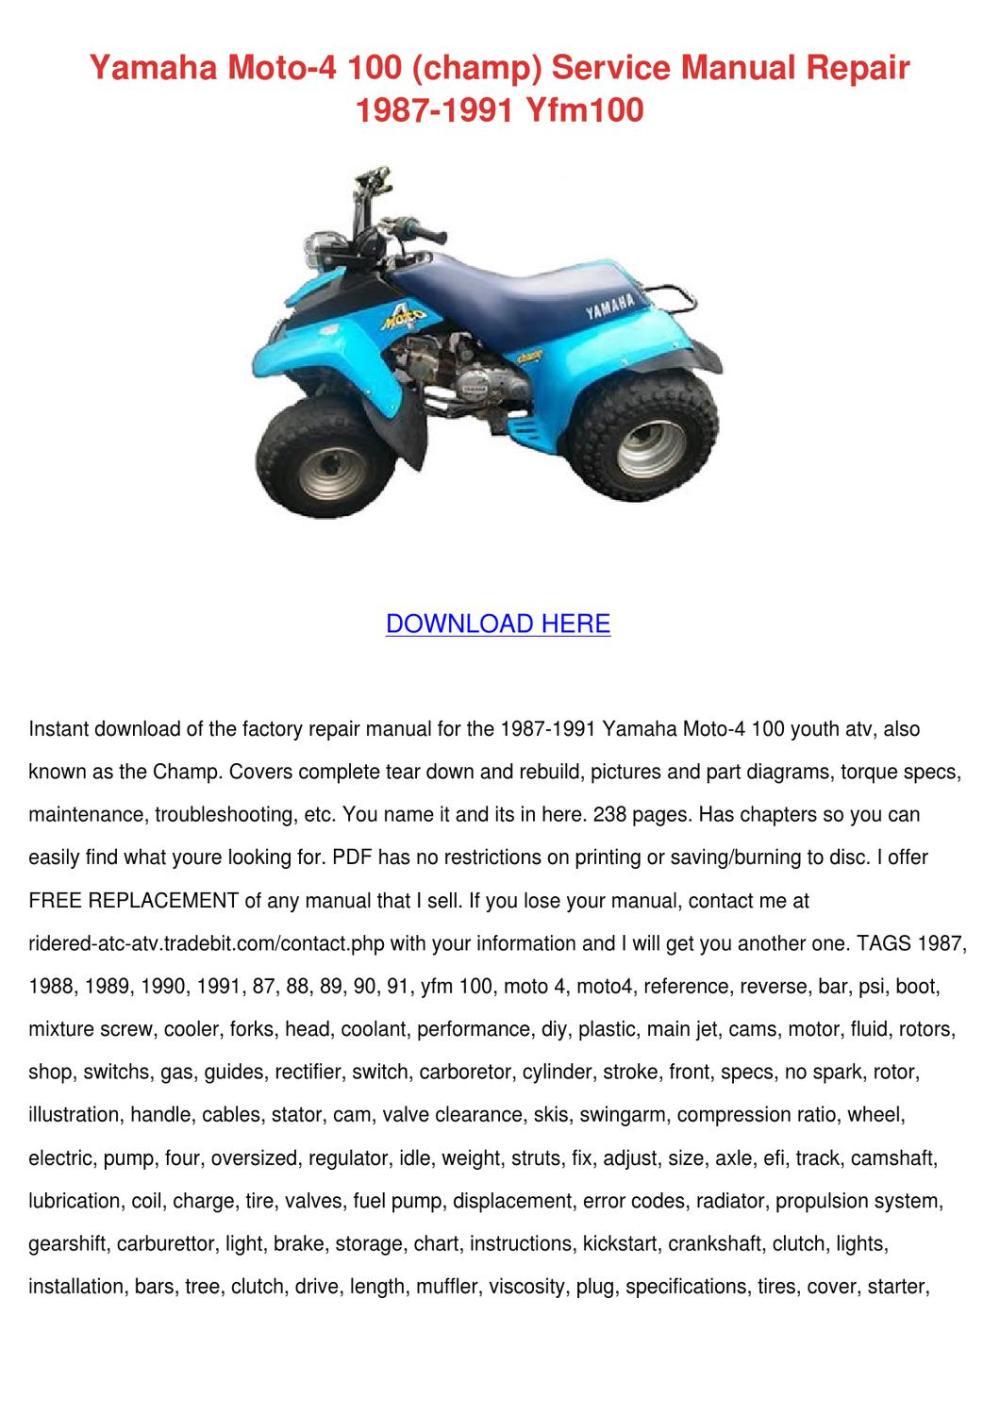 medium resolution of yamaha moto 4 100 champ service manual repair